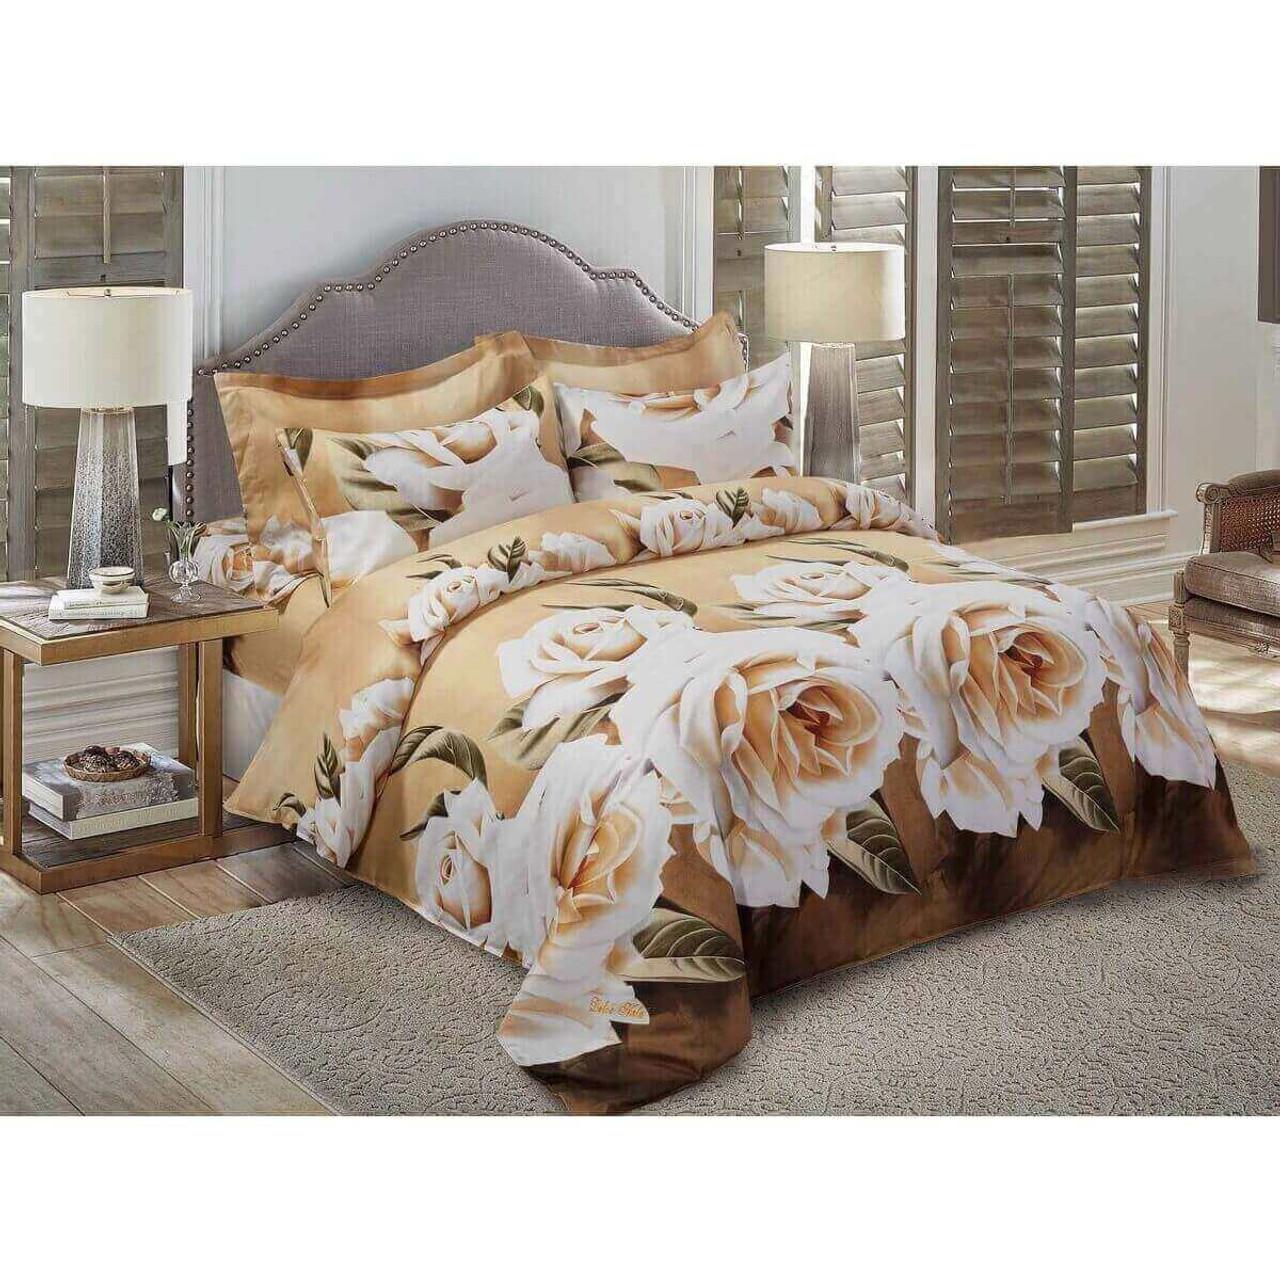 Drop-shipping Wholesale Bedding Sets DM710K